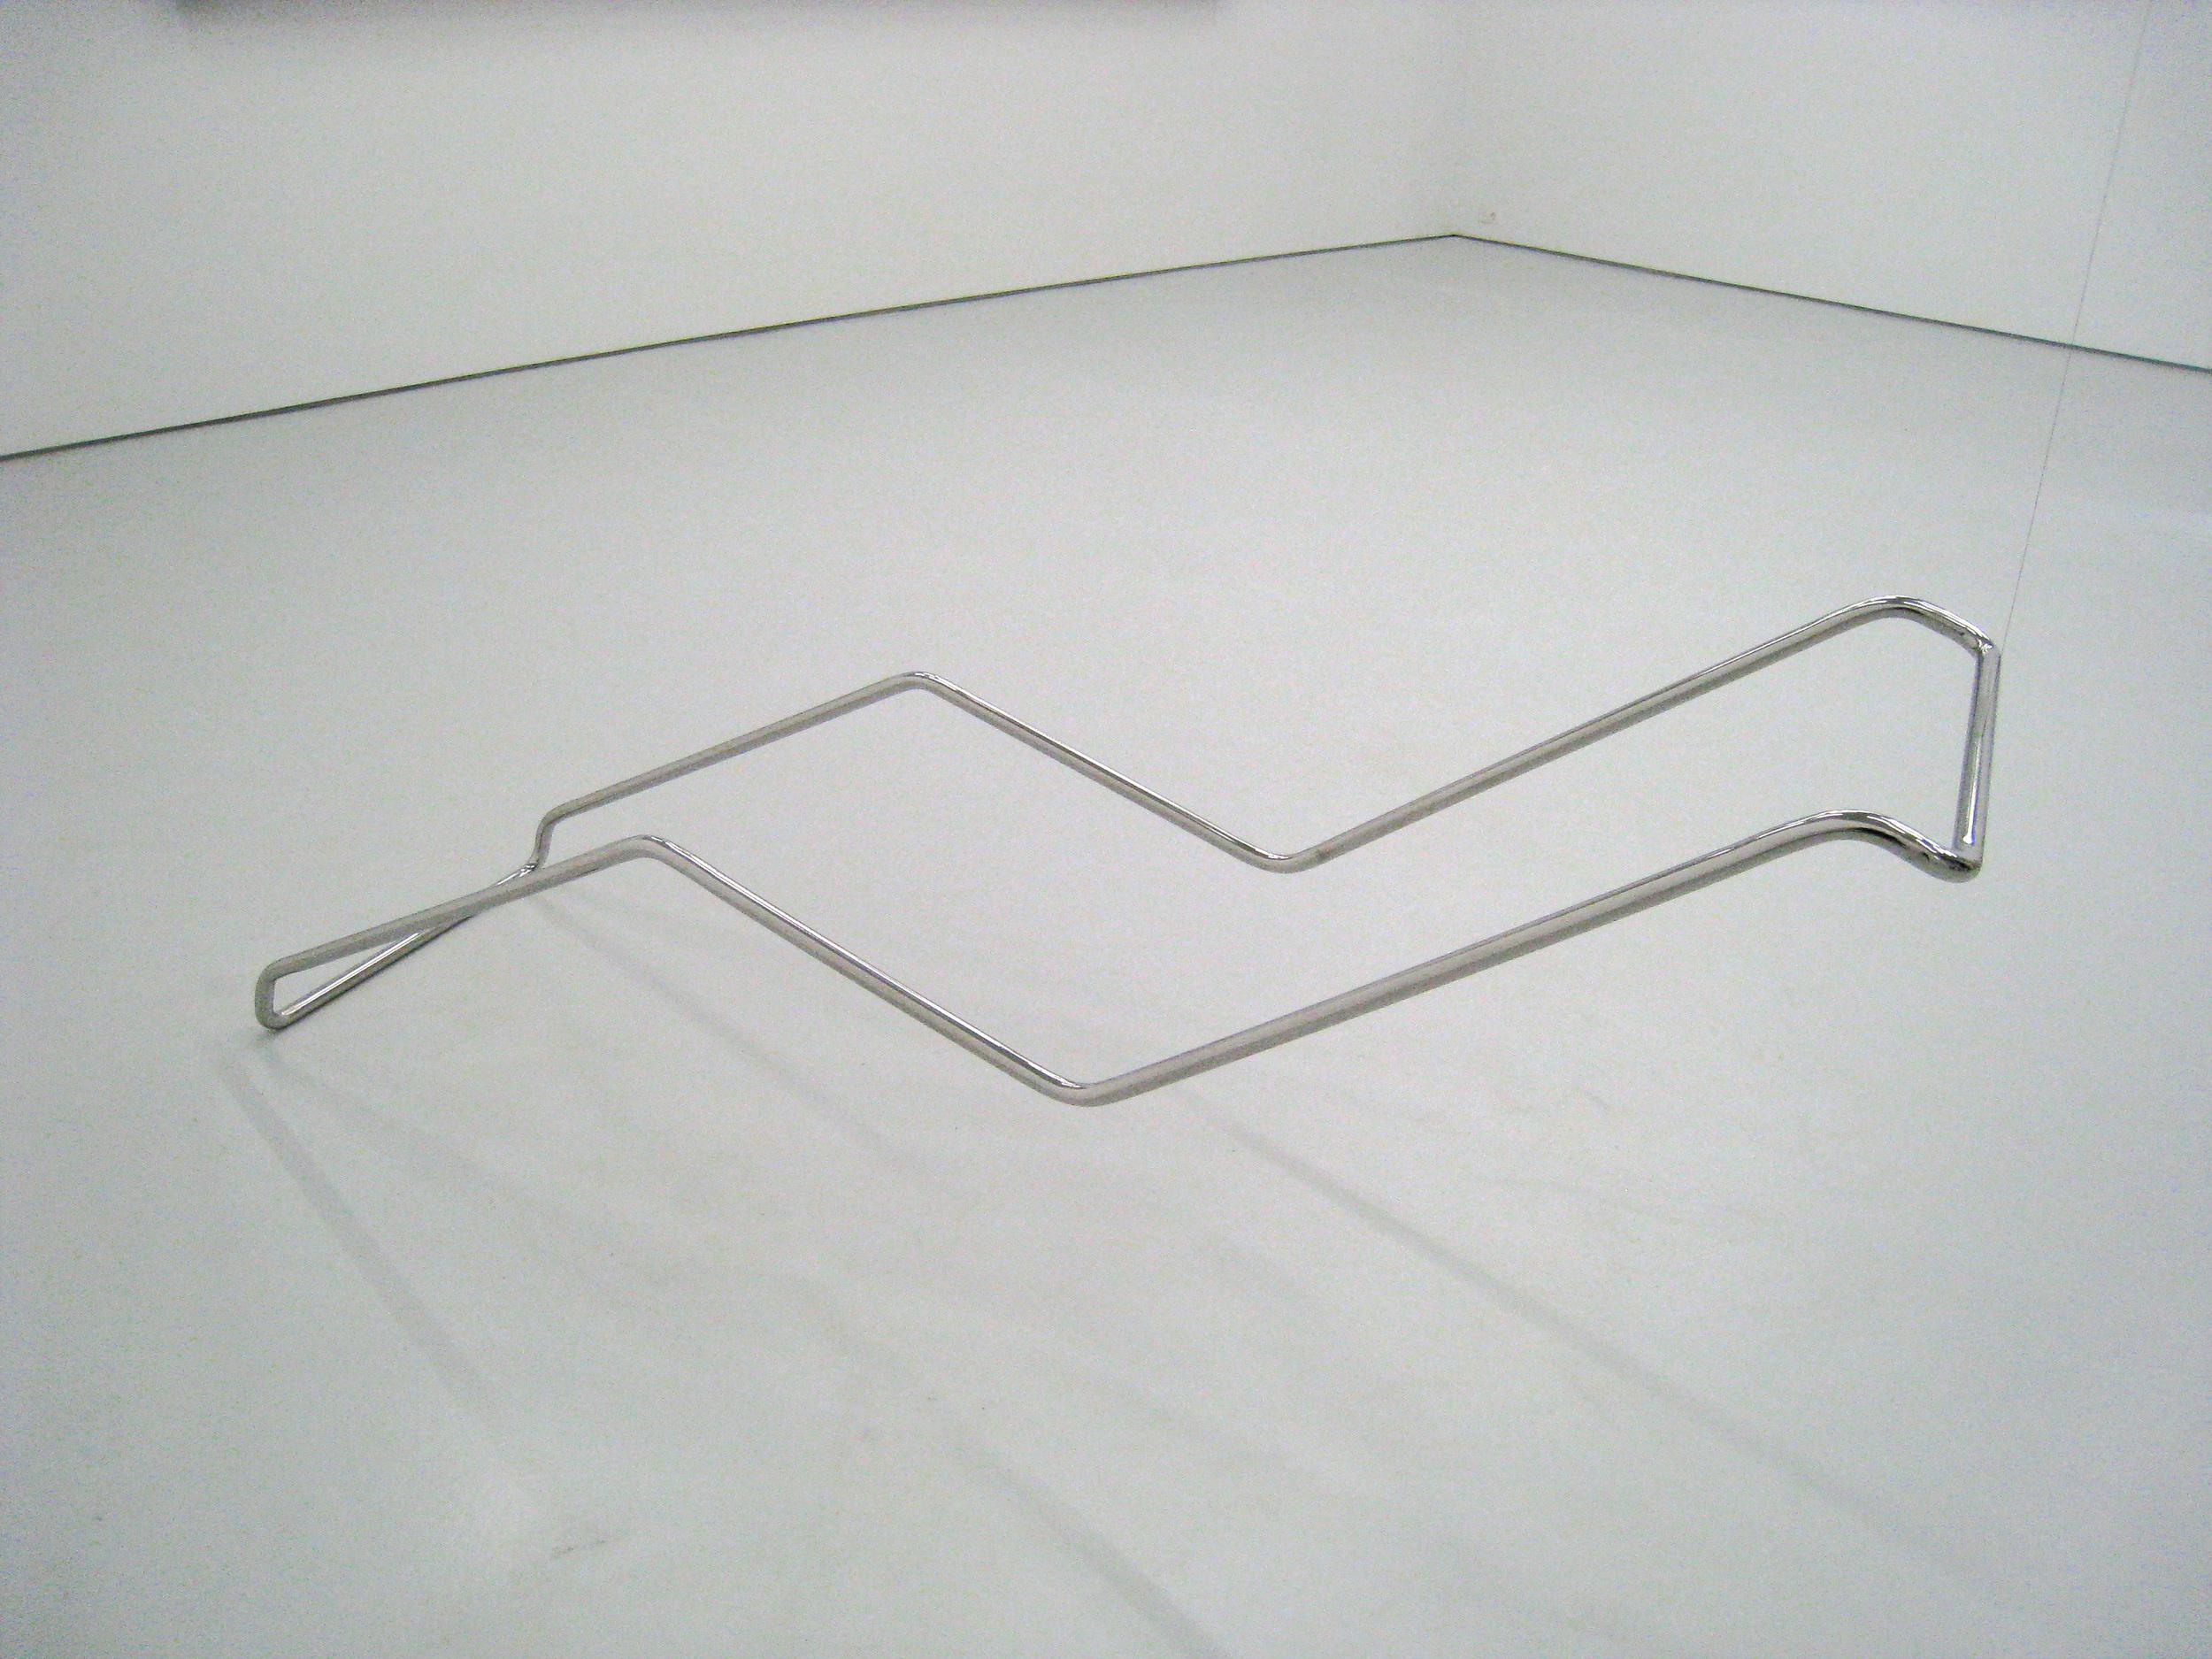 Fernanda Fragateiro  Recliner , 2009 polished stainless steel, 210 x 60 x 70 cm